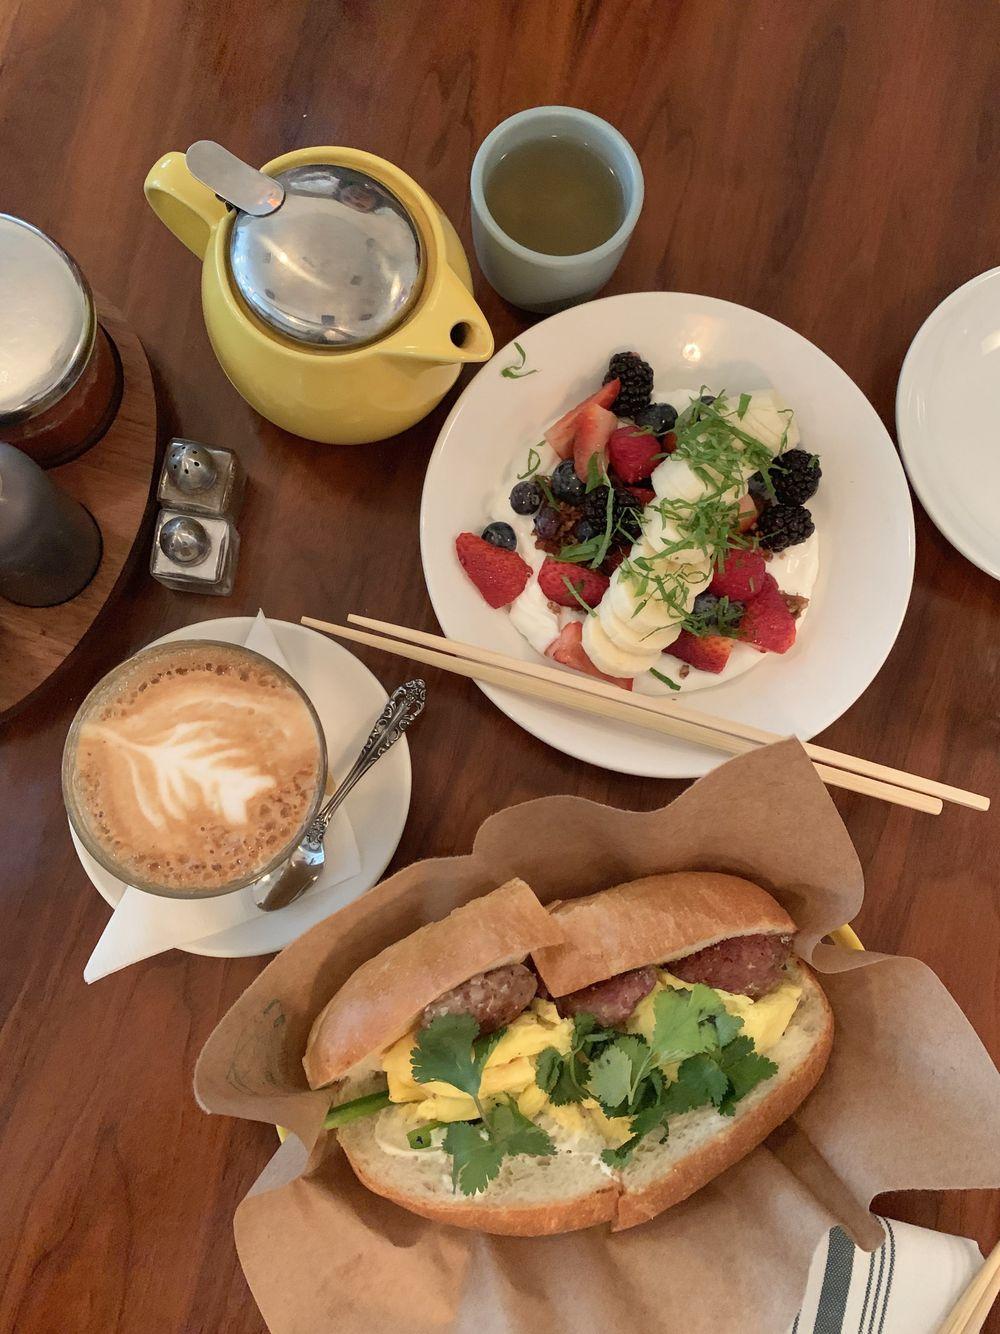 Yogurt and Sausage & Egg Sandwich for breakfast at Elizabeth Street Cafe, Austin